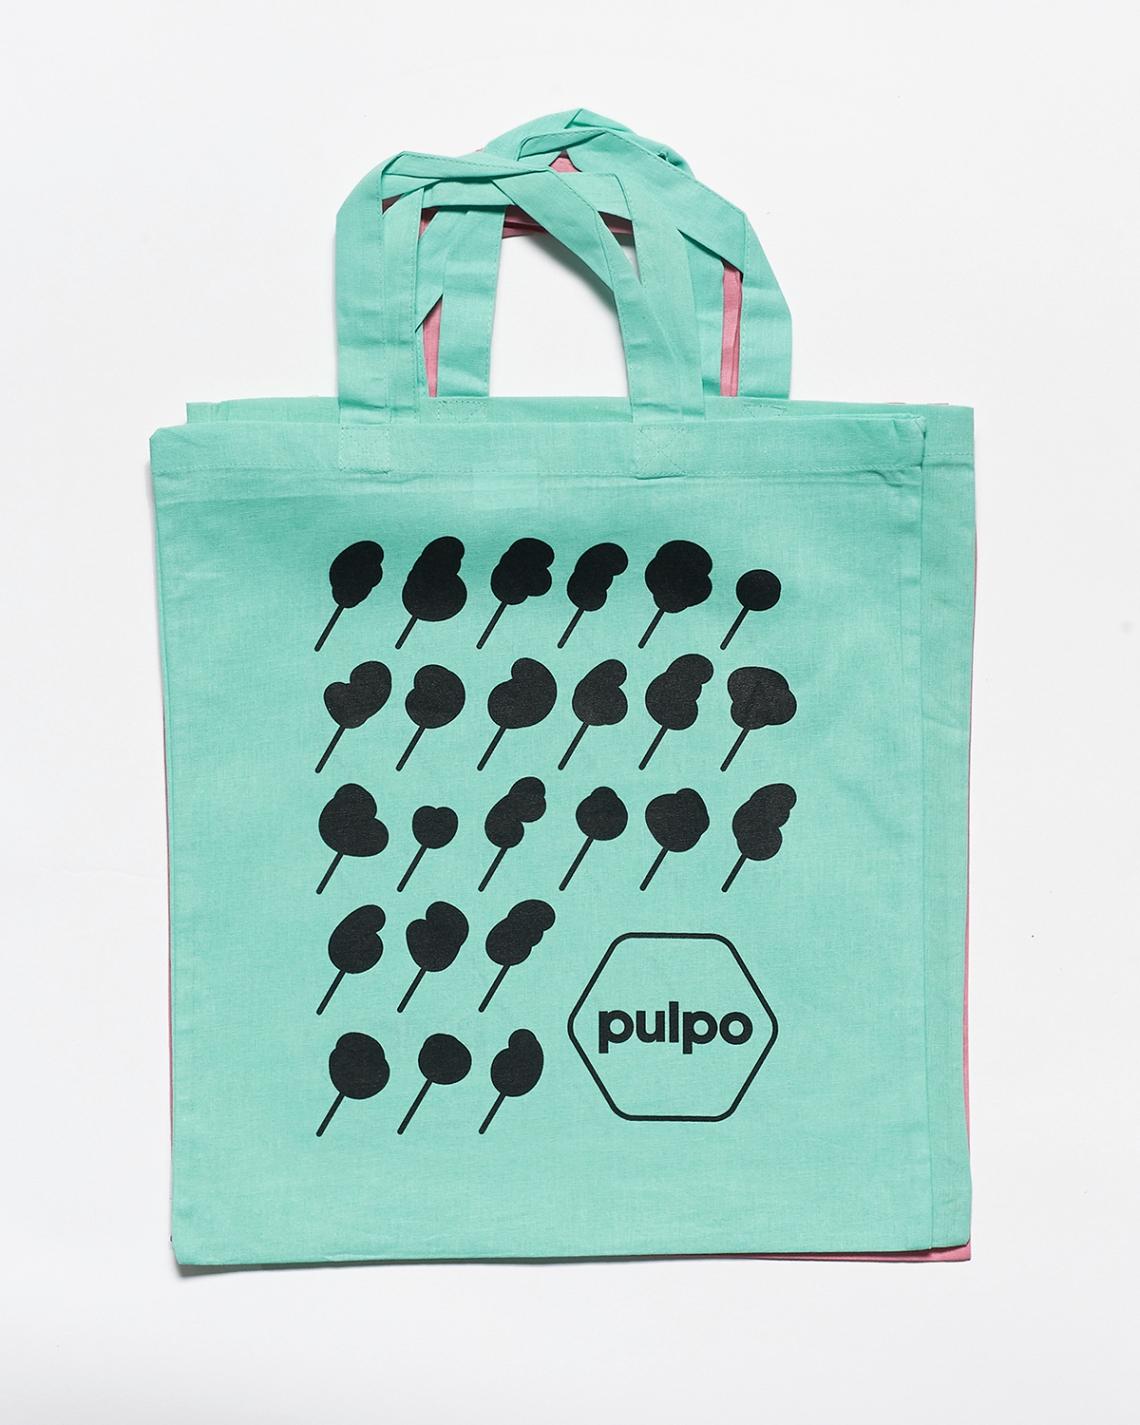 sign_pulpo003